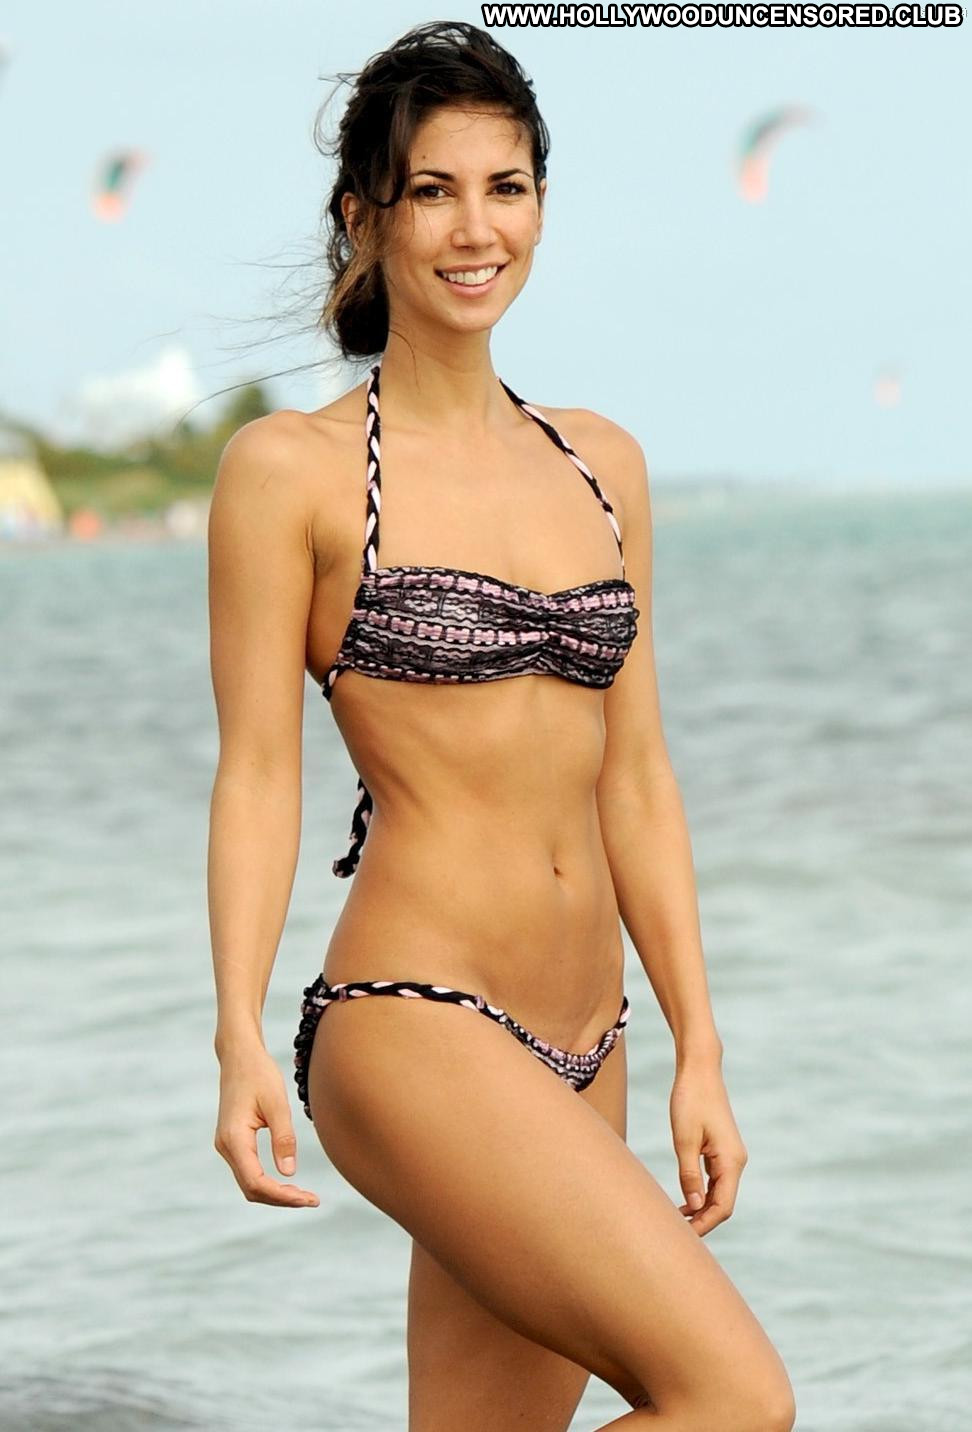 Leilani Dowding Miami Beach Miami Beach Celebrity